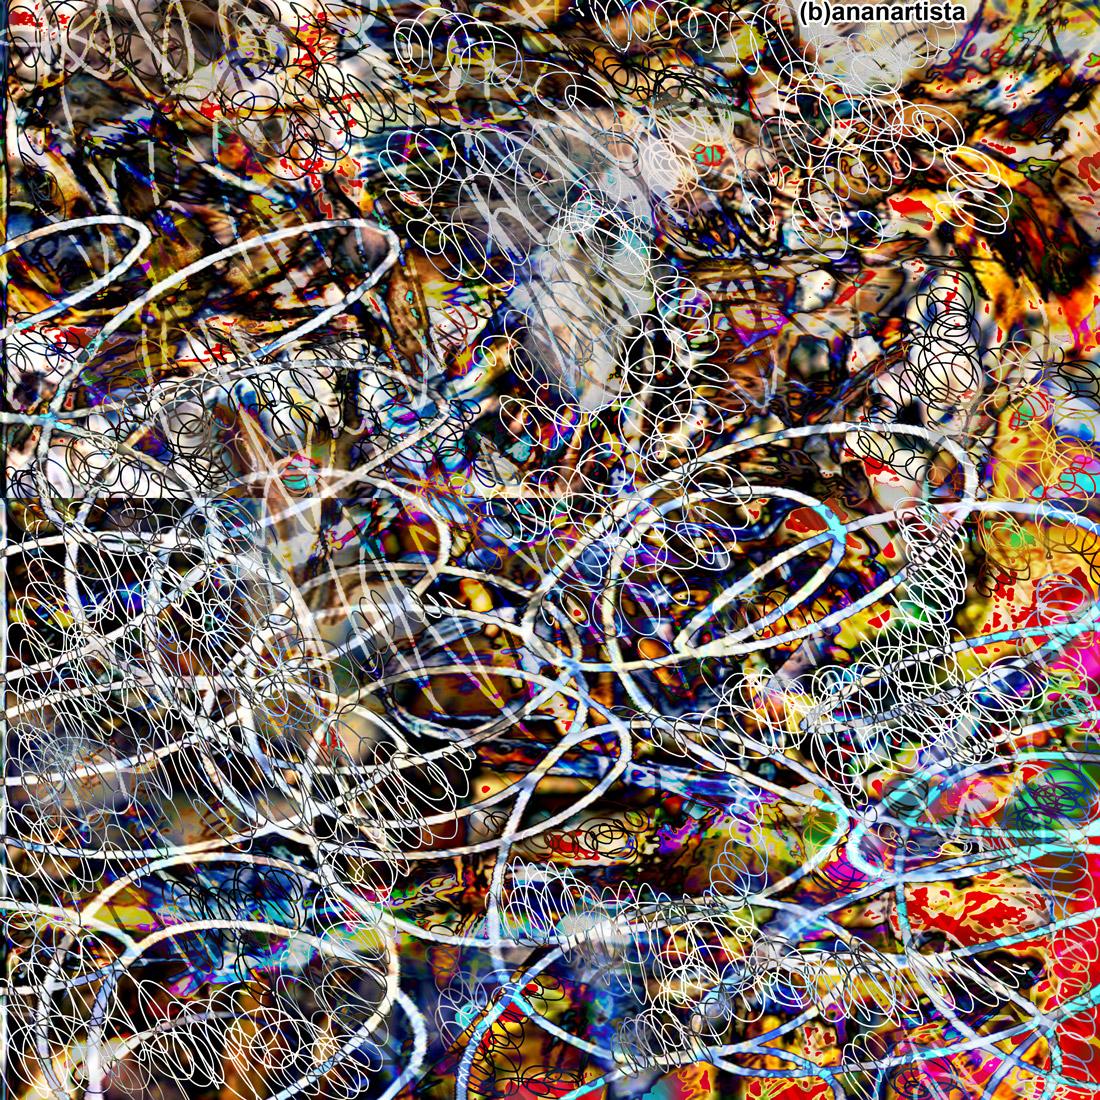 artaud: digital painting by (b)ananartista sbuff